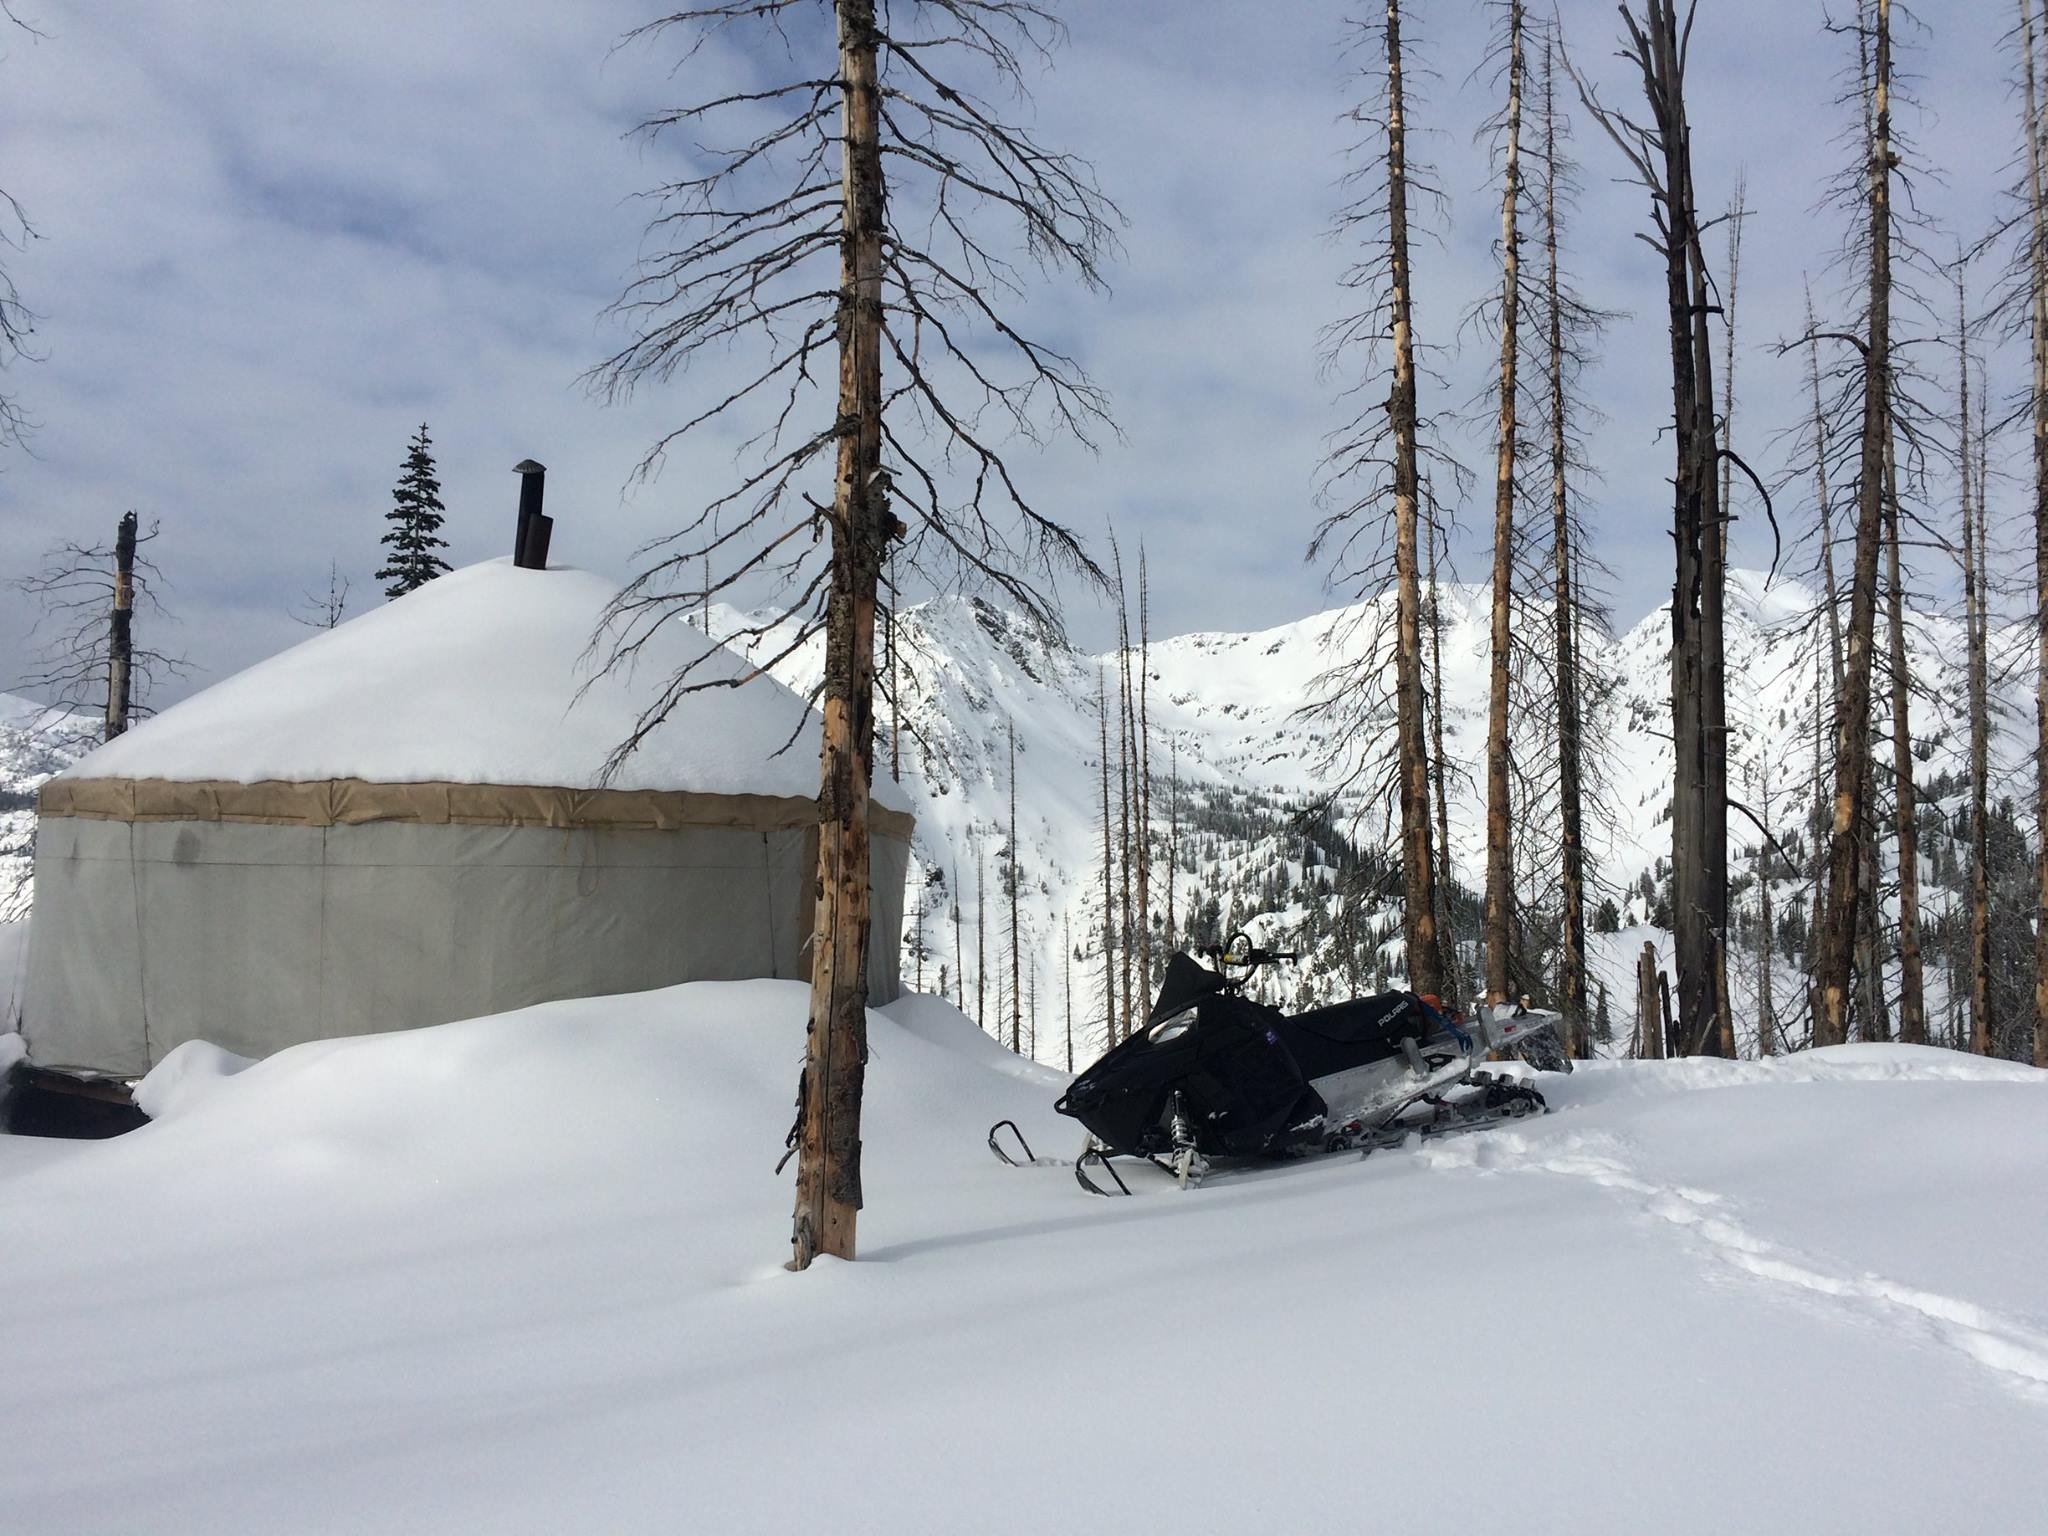 Wallowa Alpine Huts Yurt